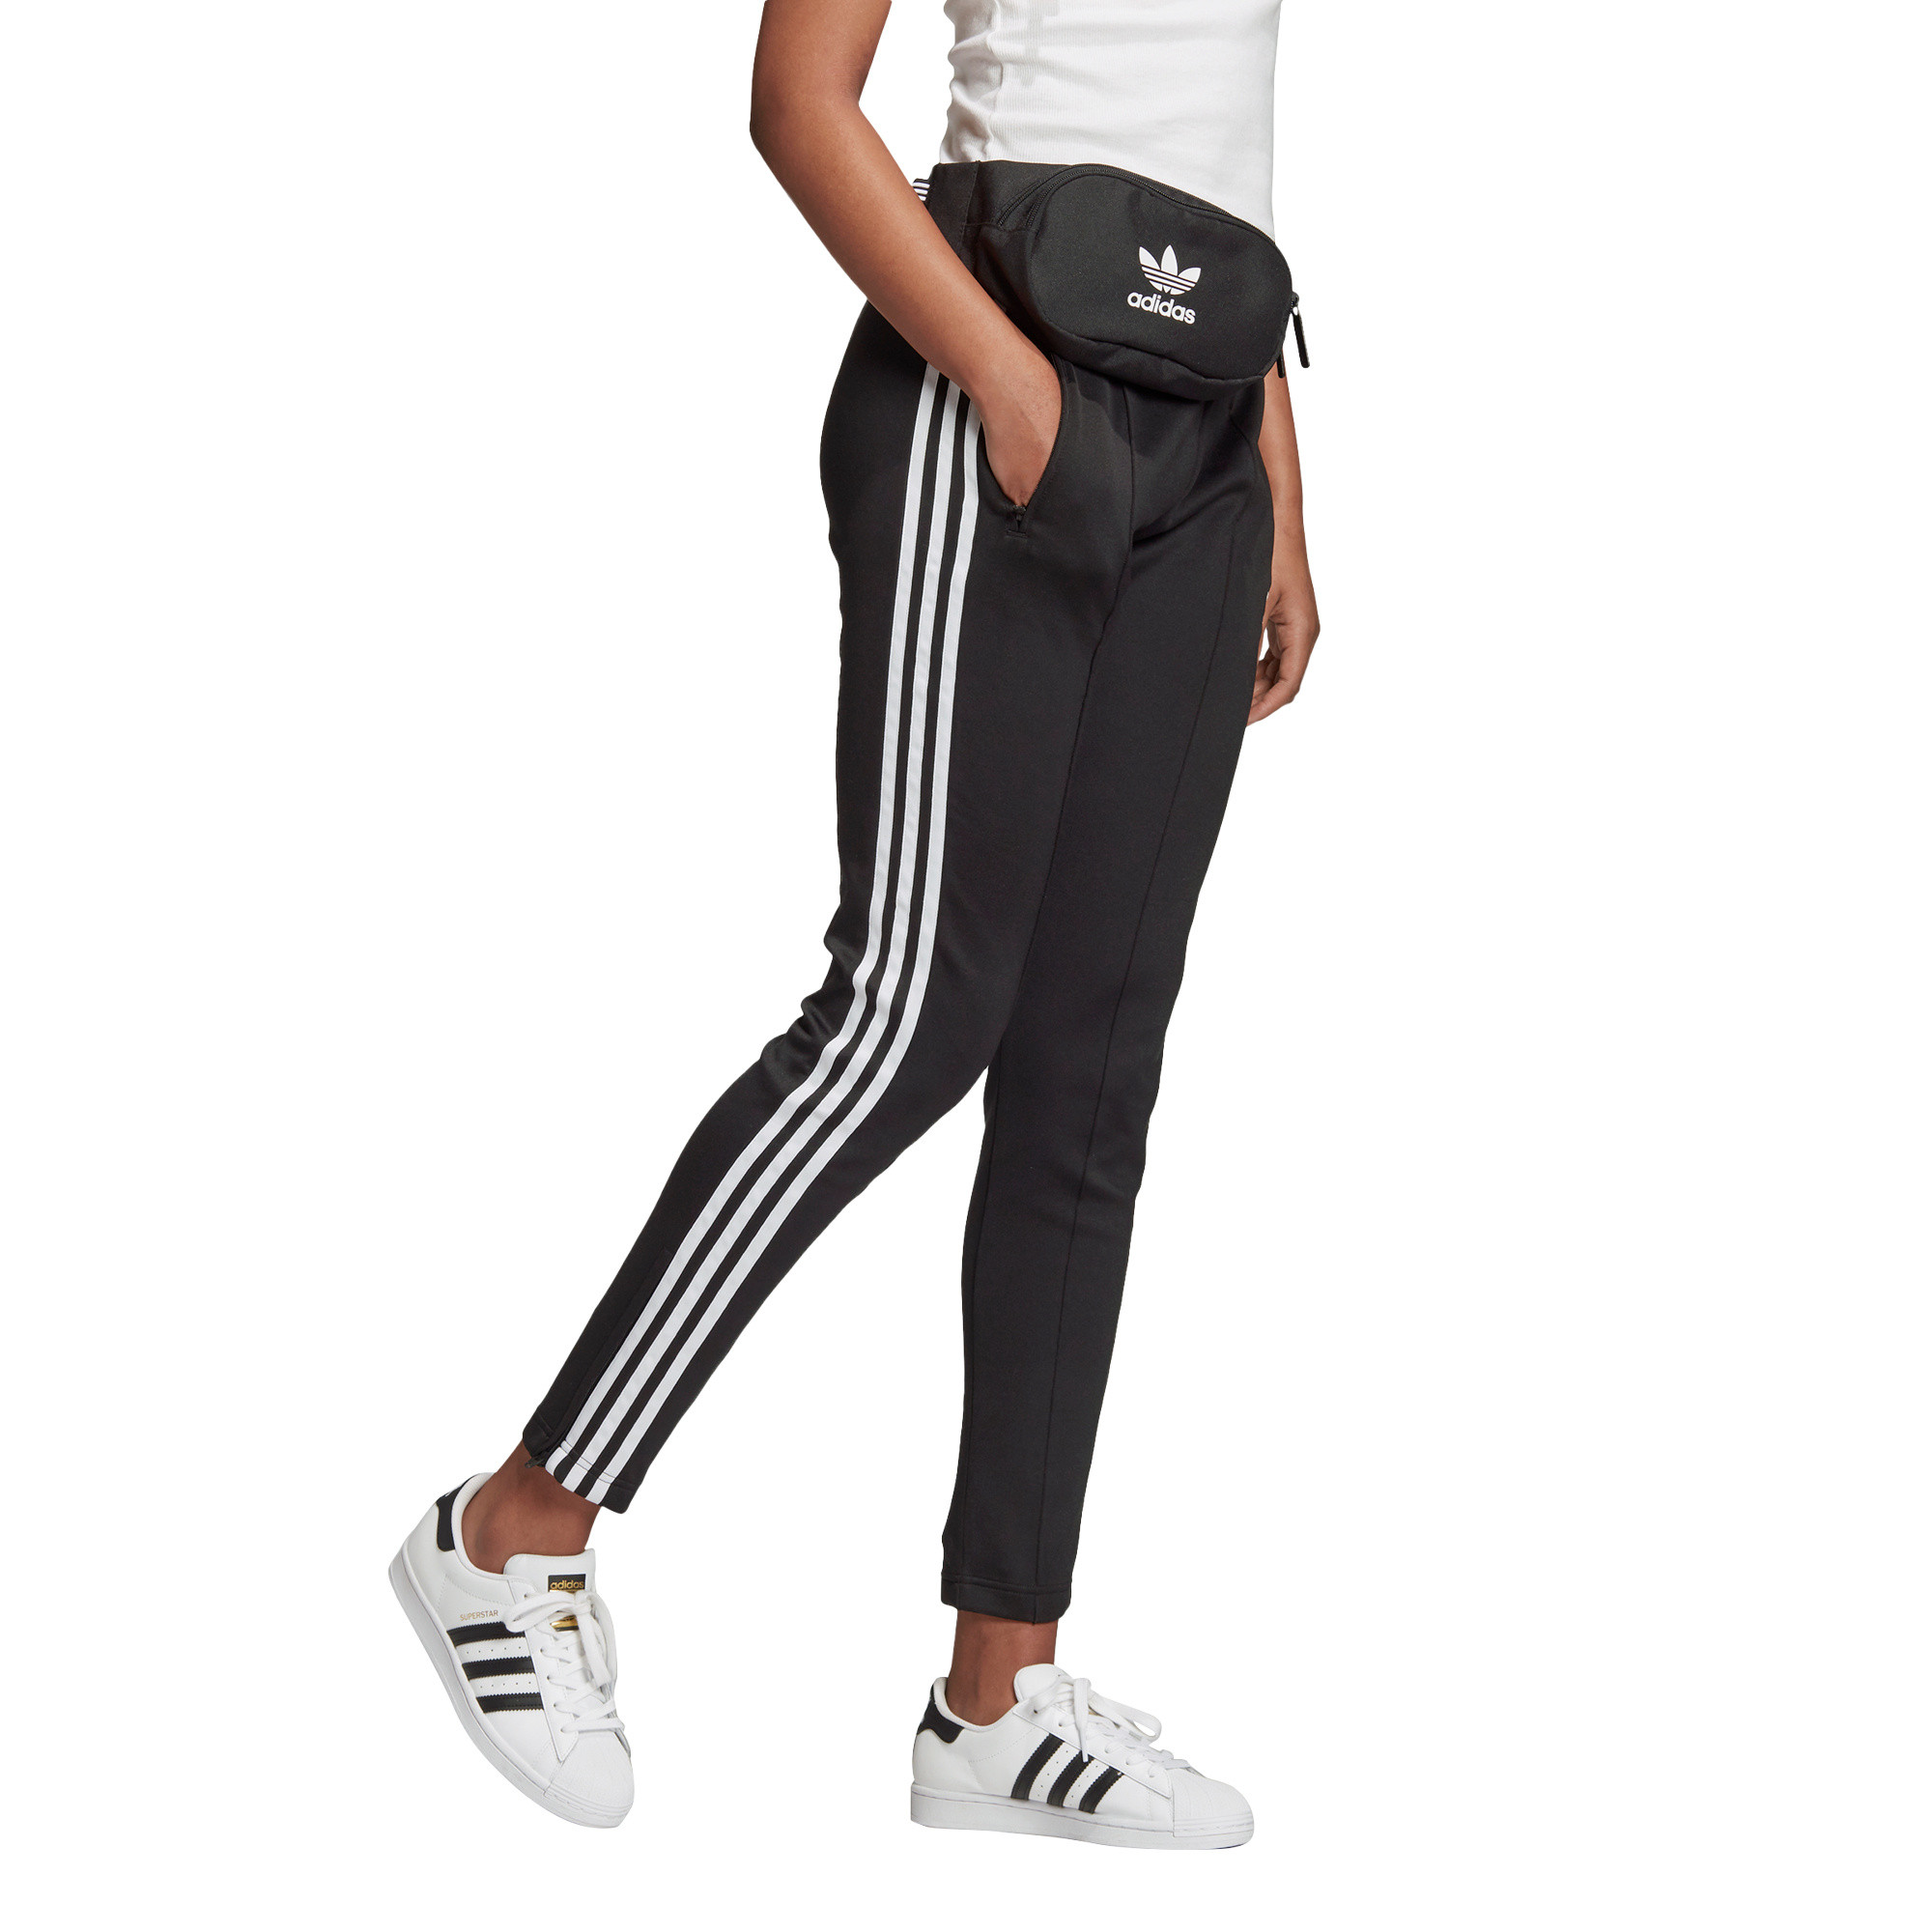 Pantaloni tuta Primeblue SST, Bianco/Nero, large image number 4